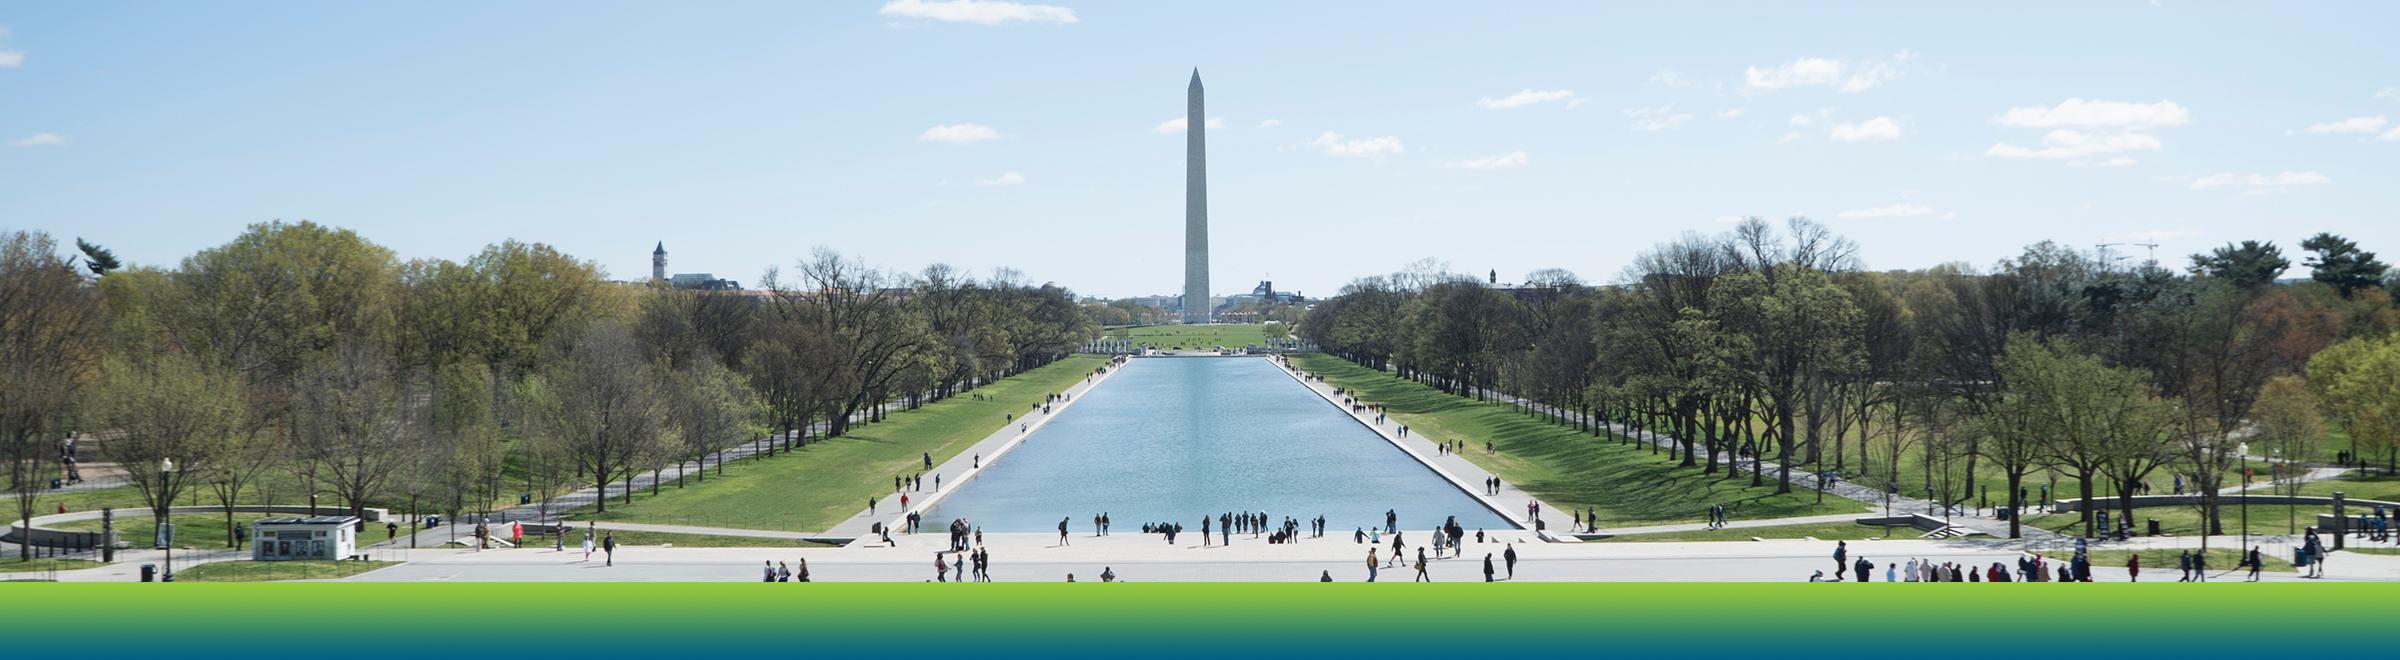 National Mall, reflecting pool, and Washington Monument.